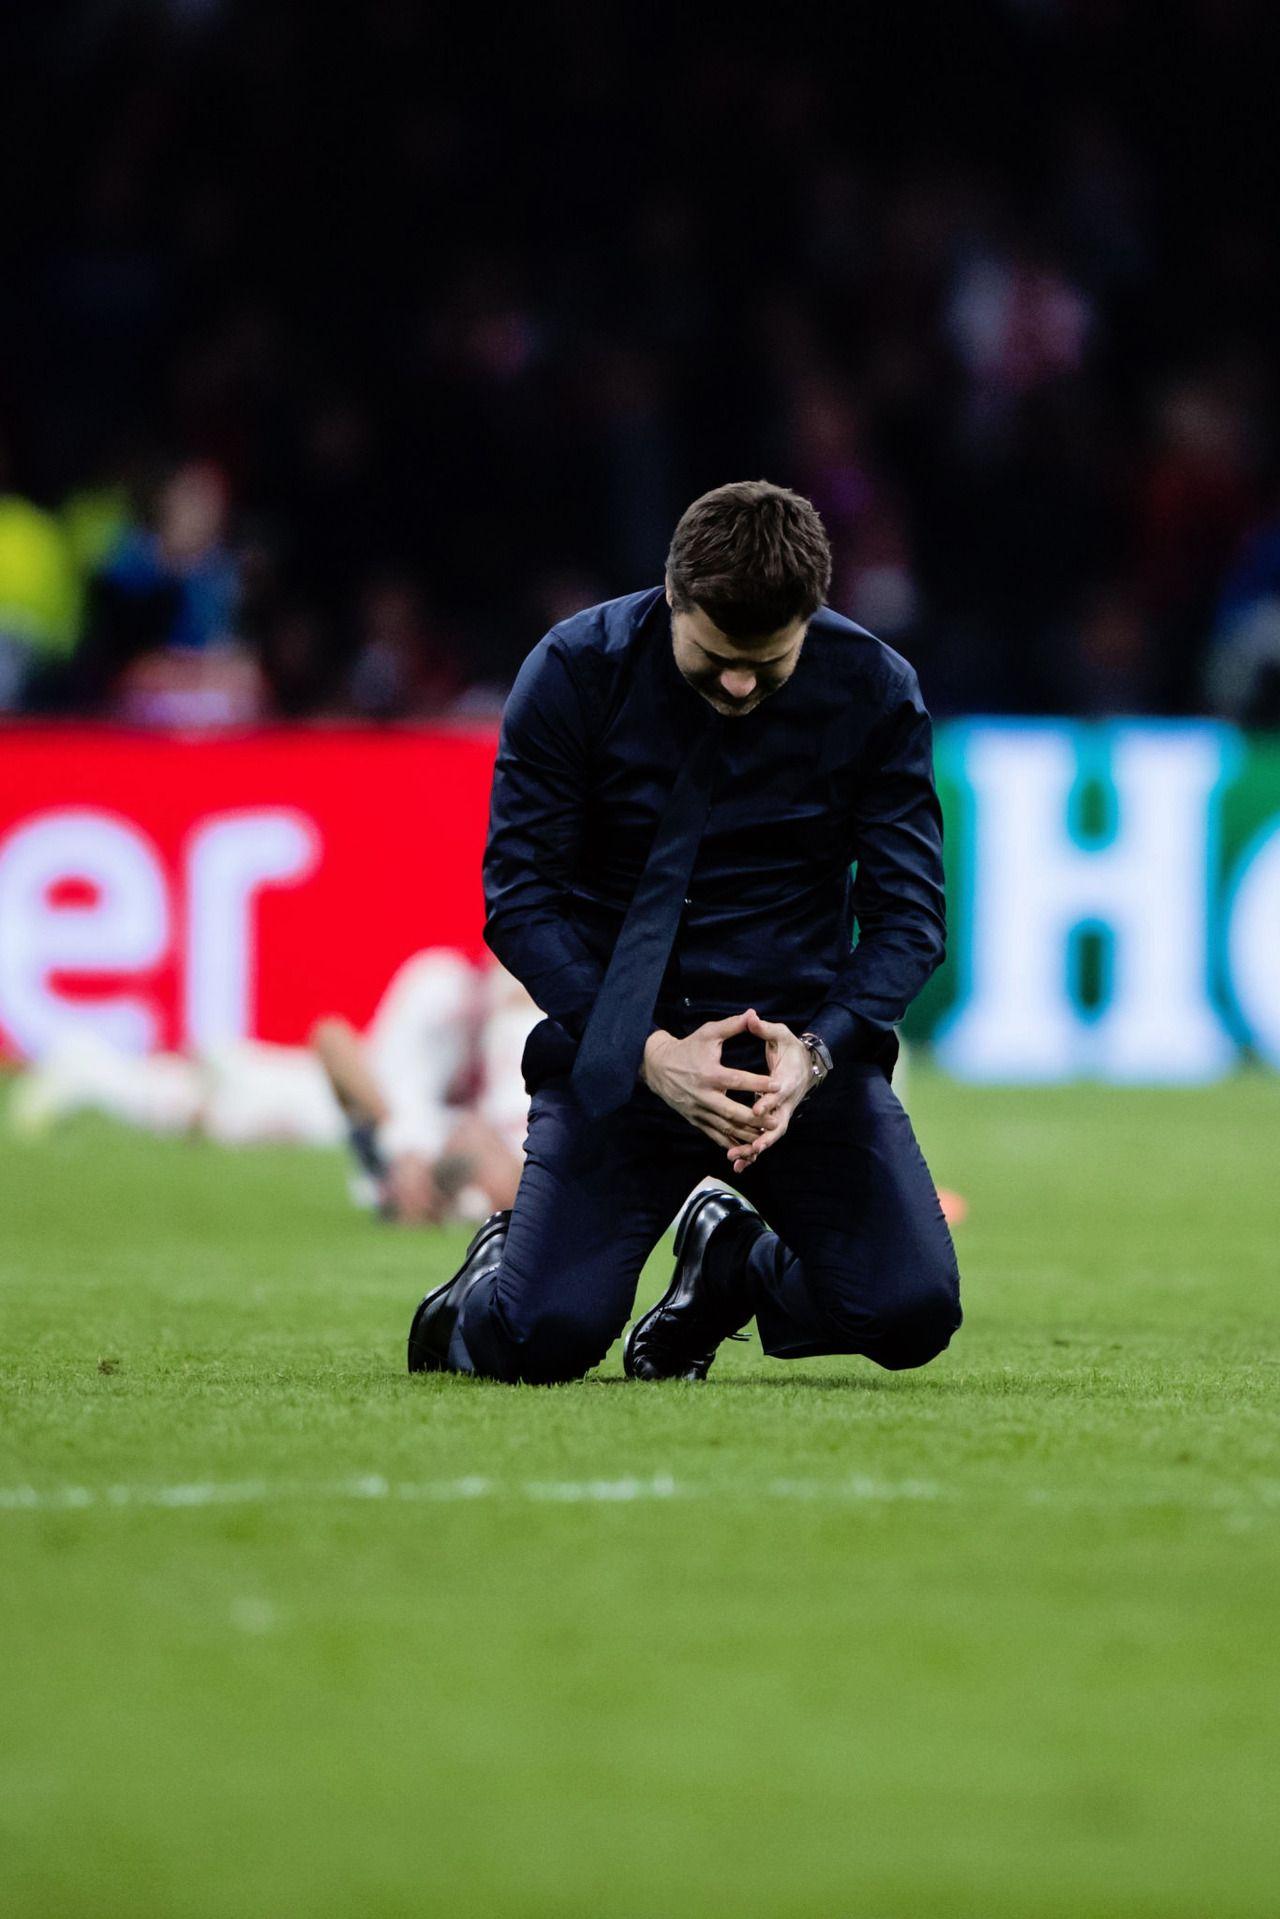 Mauricio Pochettino Tottenham Hotspurs Tottenham Hotspur Football Tottenham Hotspur Players Tottenham Hotspur